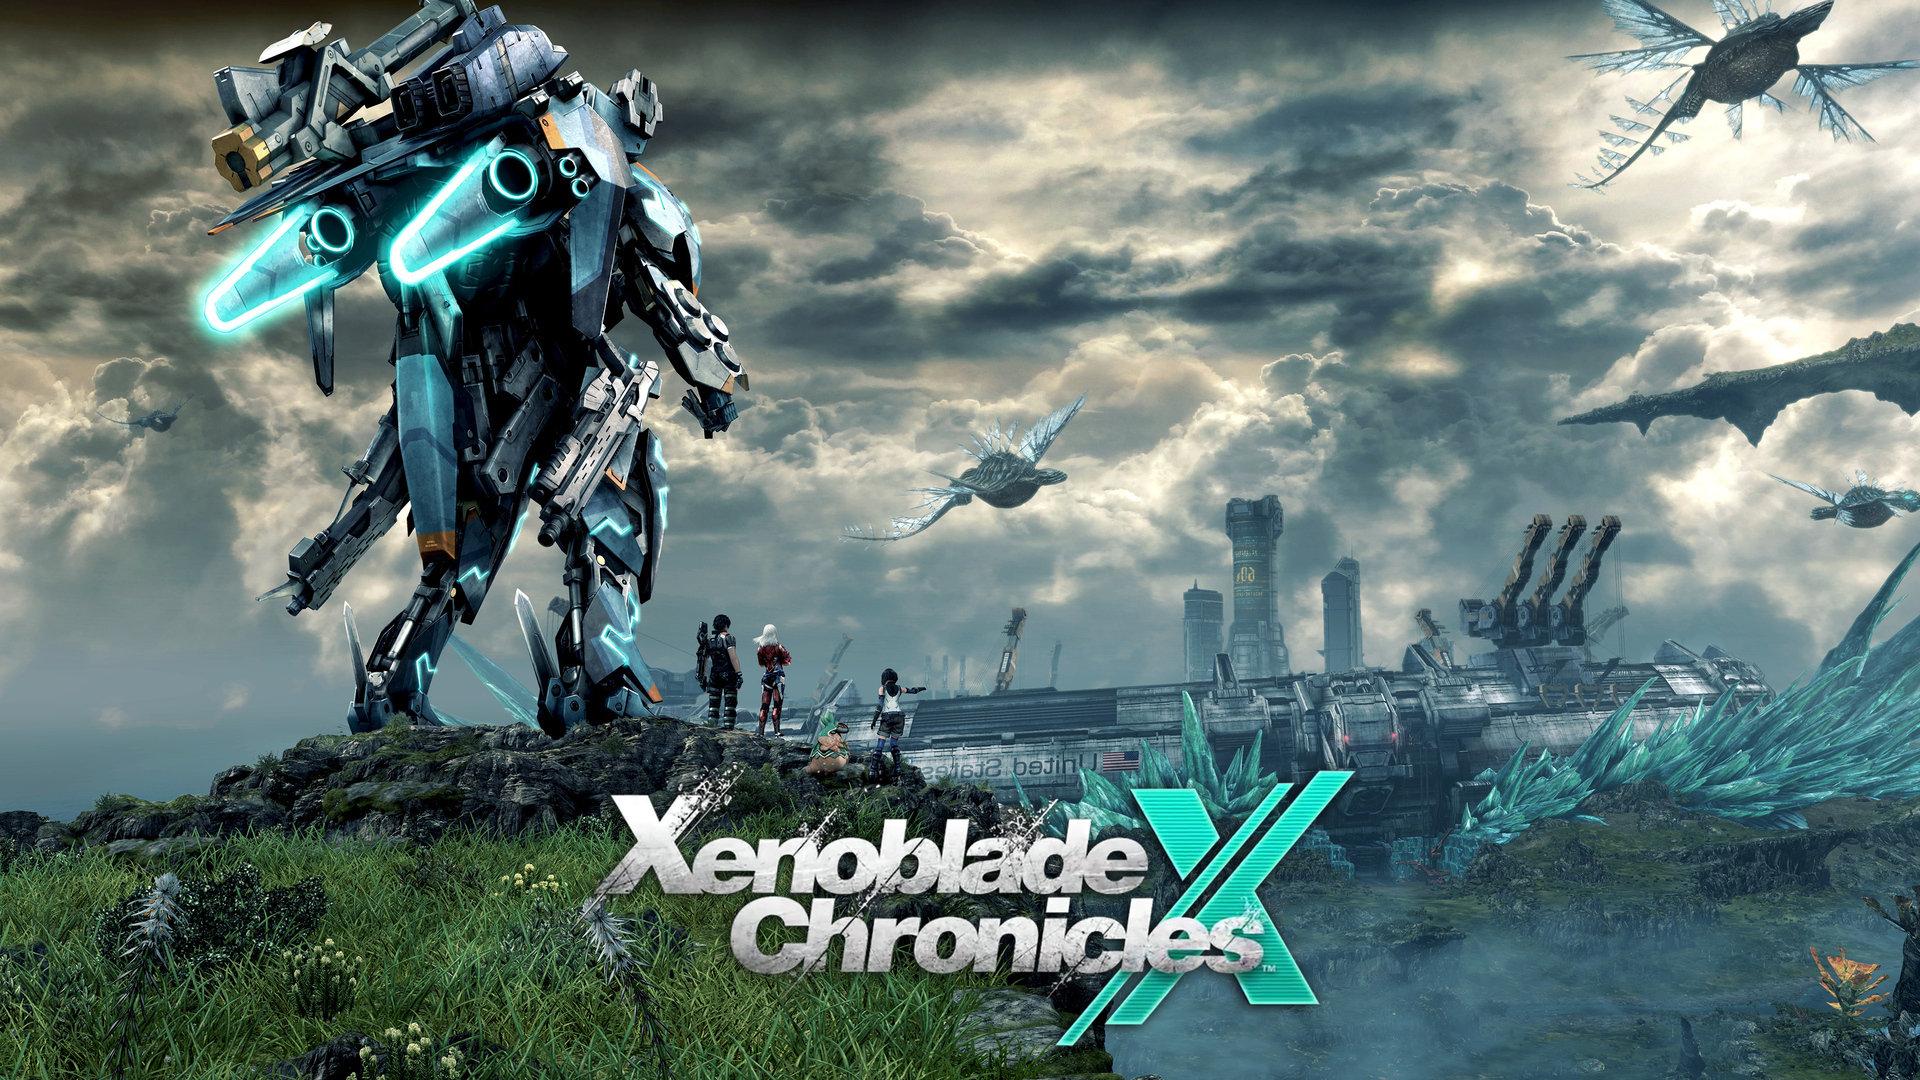 Xenoblade Chronicles Wallpapers 1920x1080 Full Hd 1080p Desktop